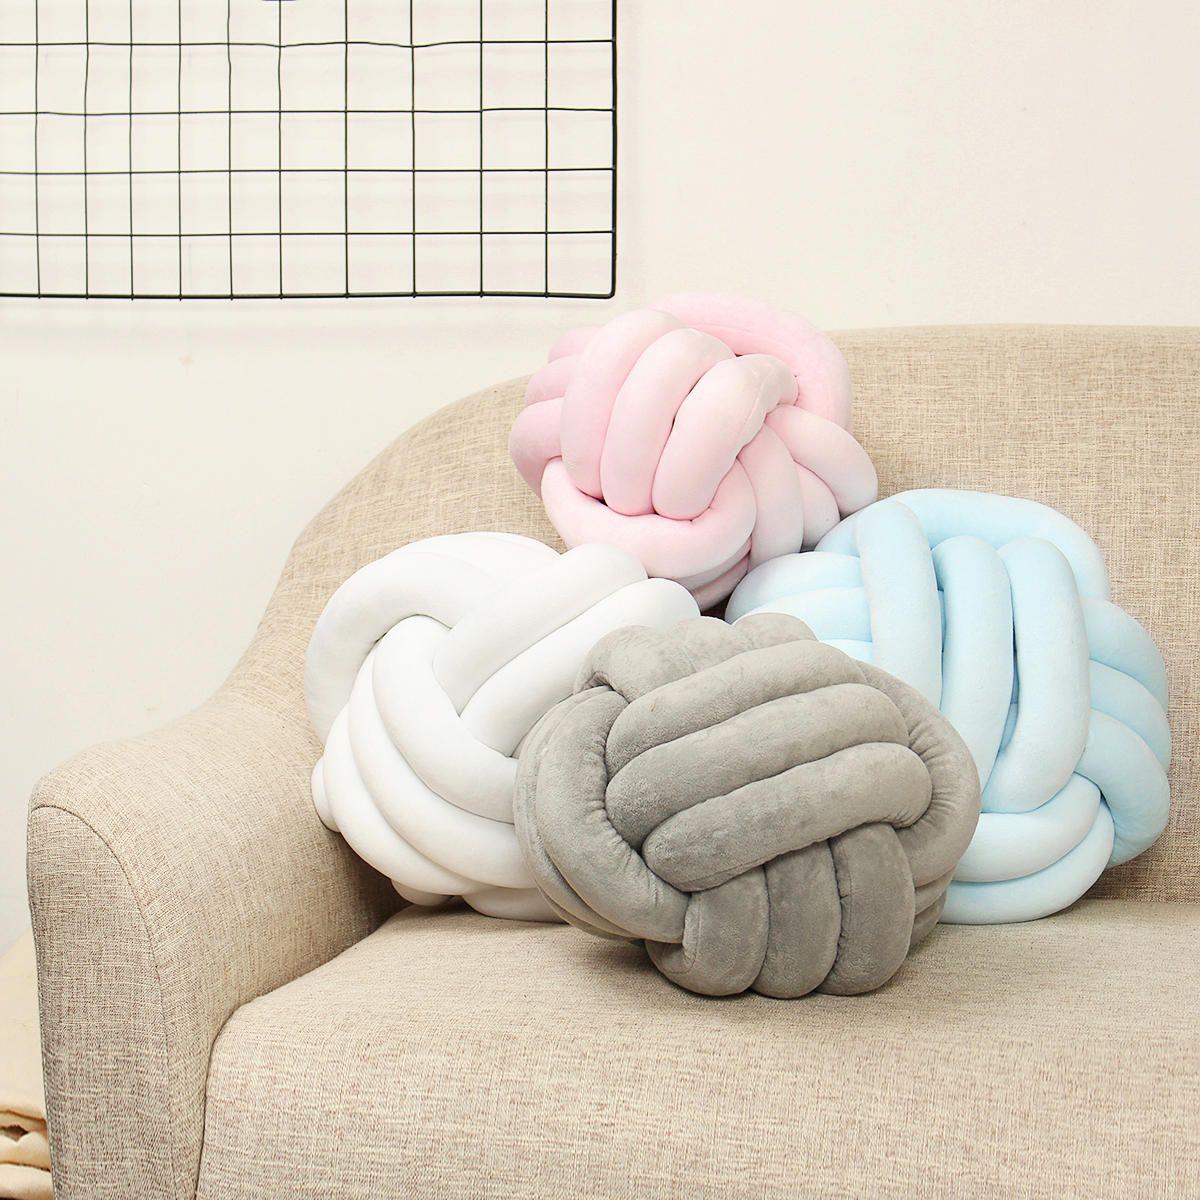 Plush Knot Cushion Knotted Ball Pillow Kid Soft Pillow Car Home Sofa Decor Gift